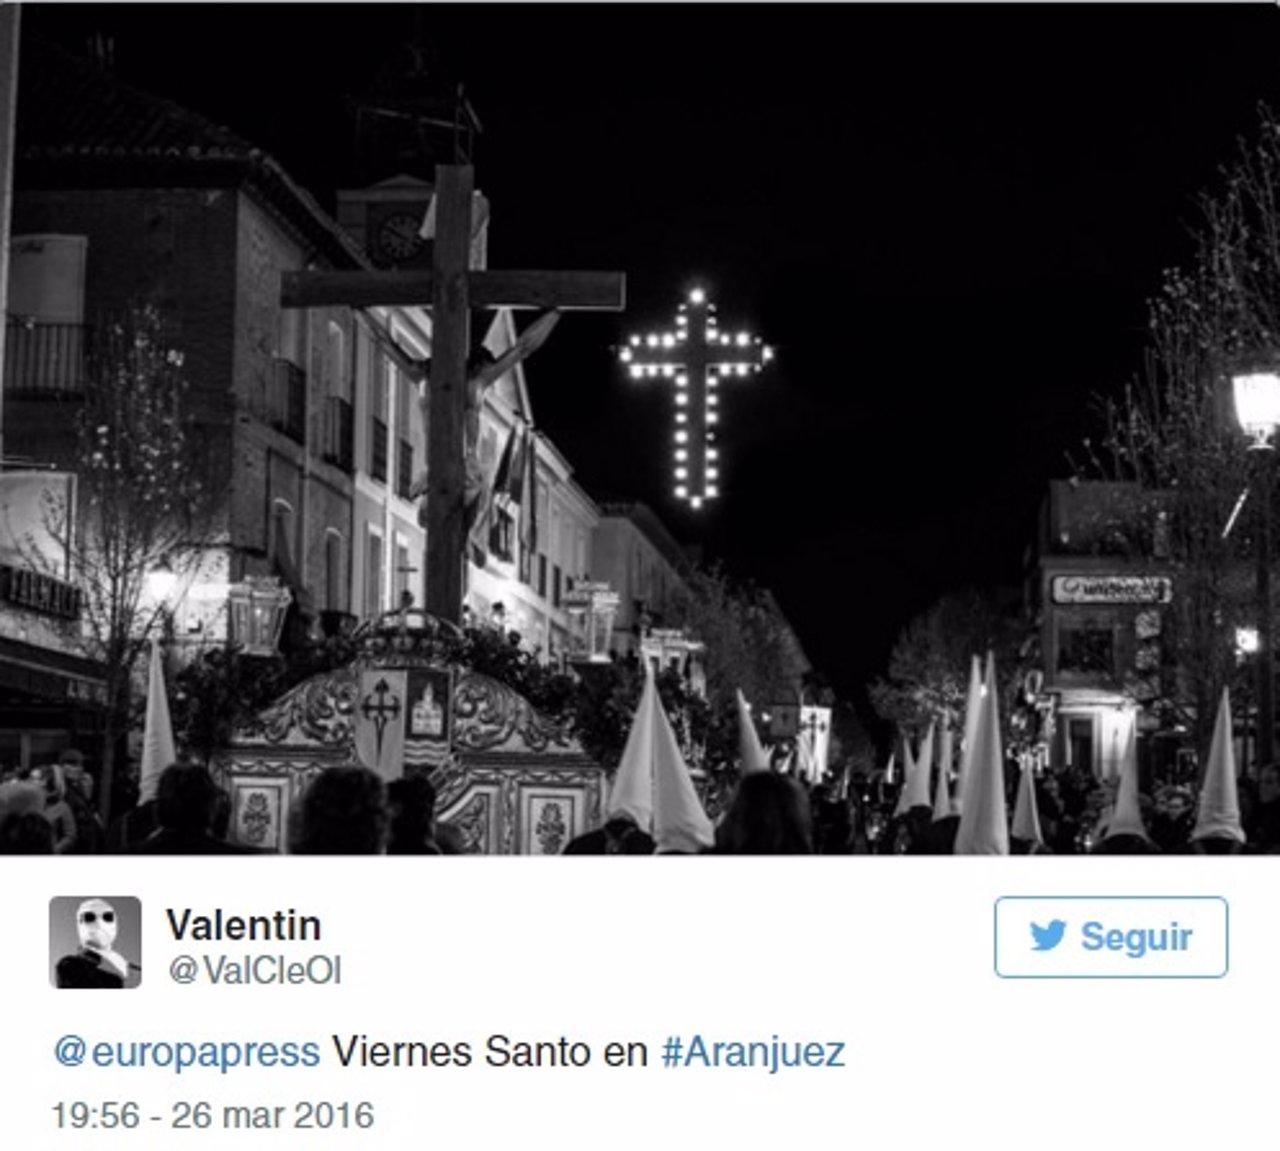 La Semana Santa de Aranjuez